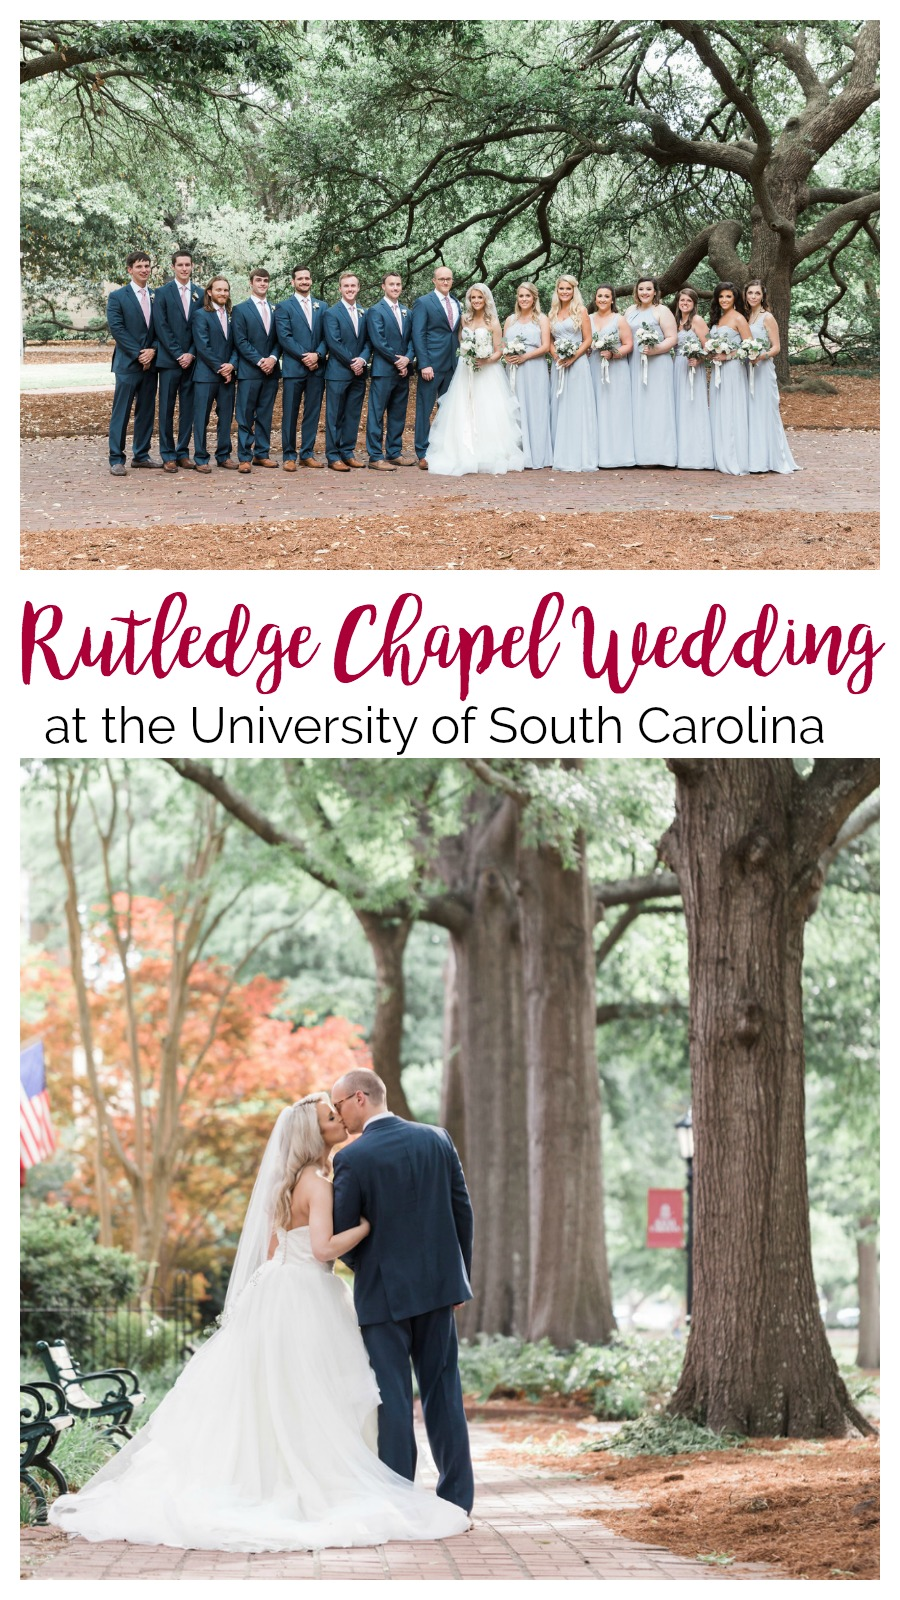 Gamble and Jordan: Rutledge Chapel Wedding at the University of South Carolina | Palmetto State Weddings | Megan Manus Photography | University of South Carolina wedding | college university wedding | Columbia SC wedding